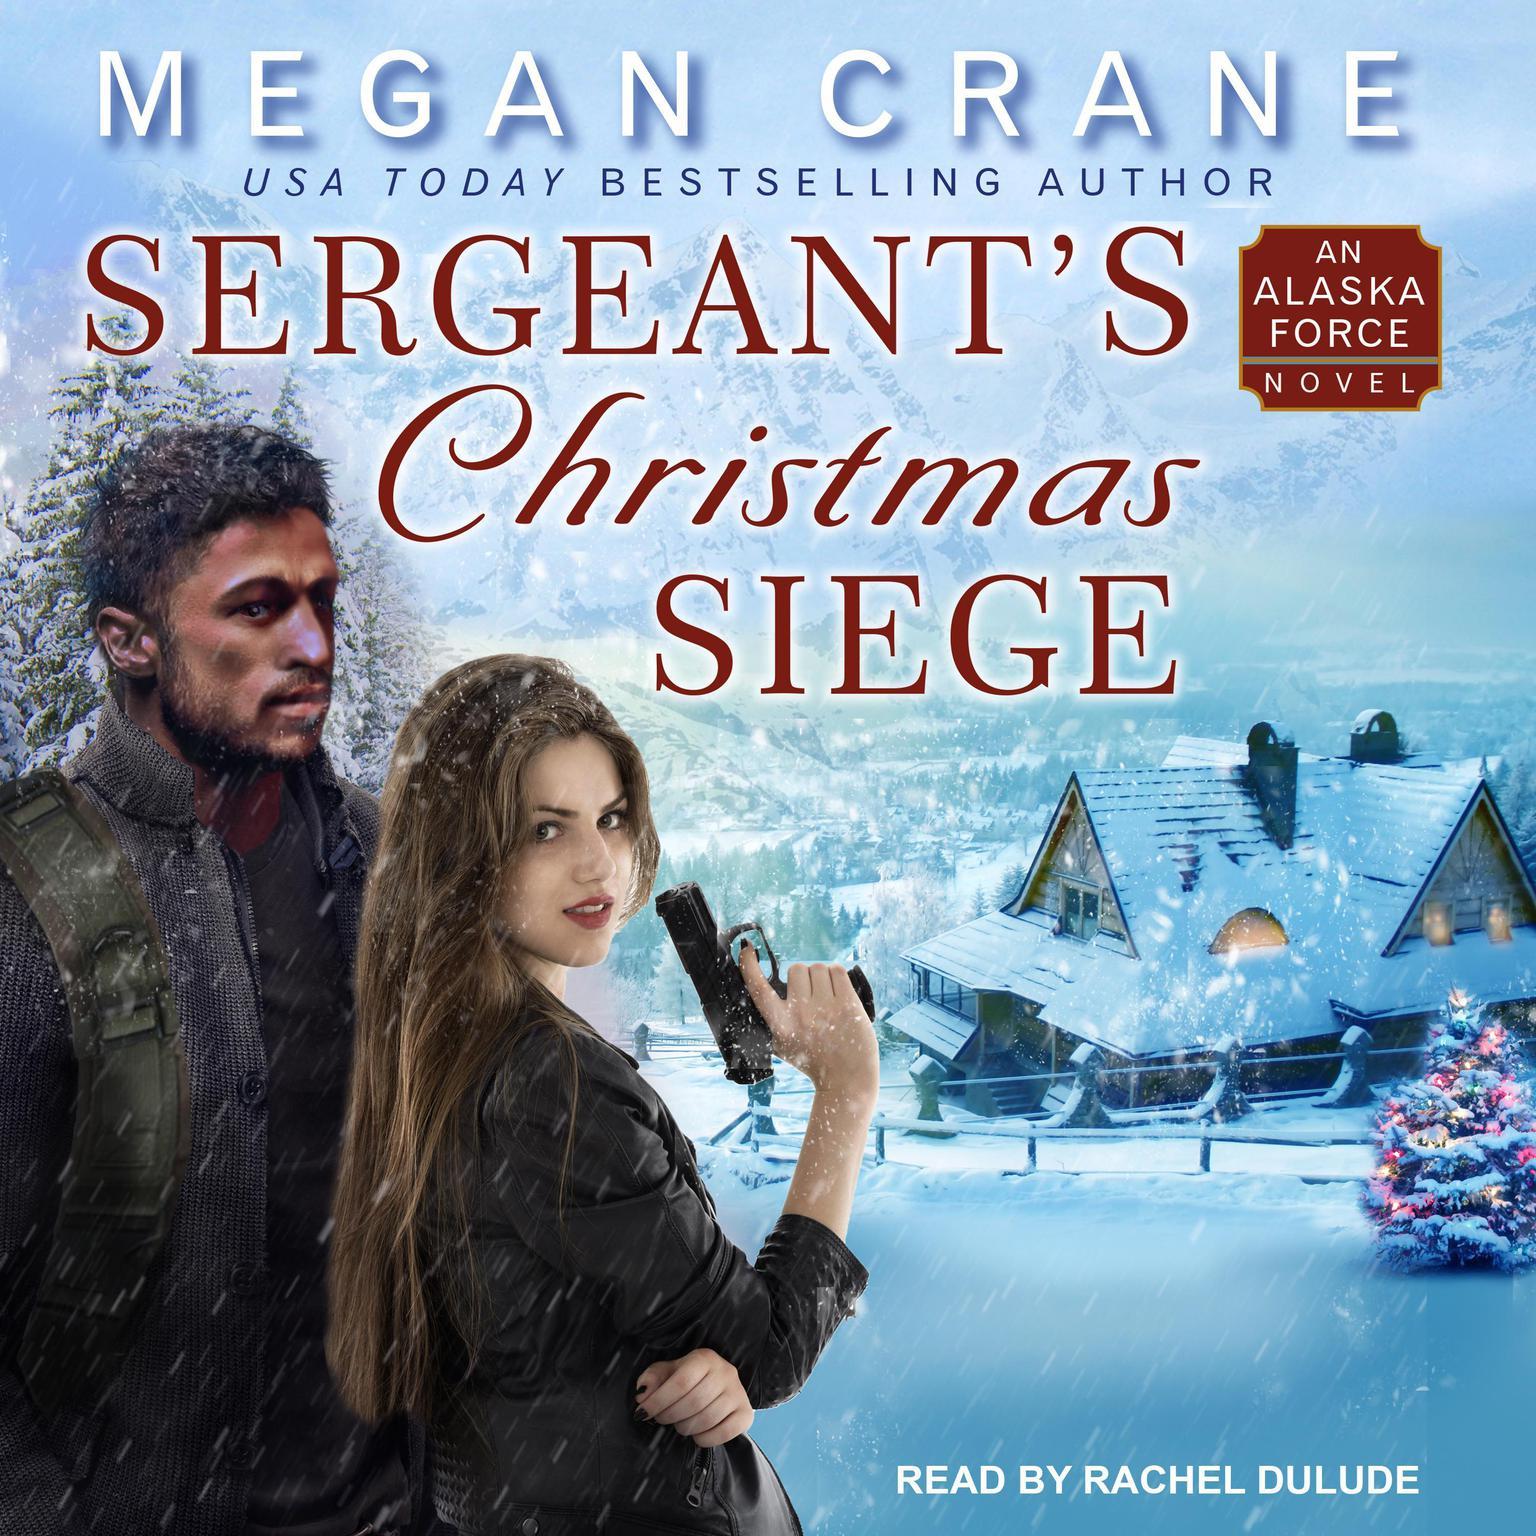 Sergeants Christmas Siege Audiobook, by Megan Crane